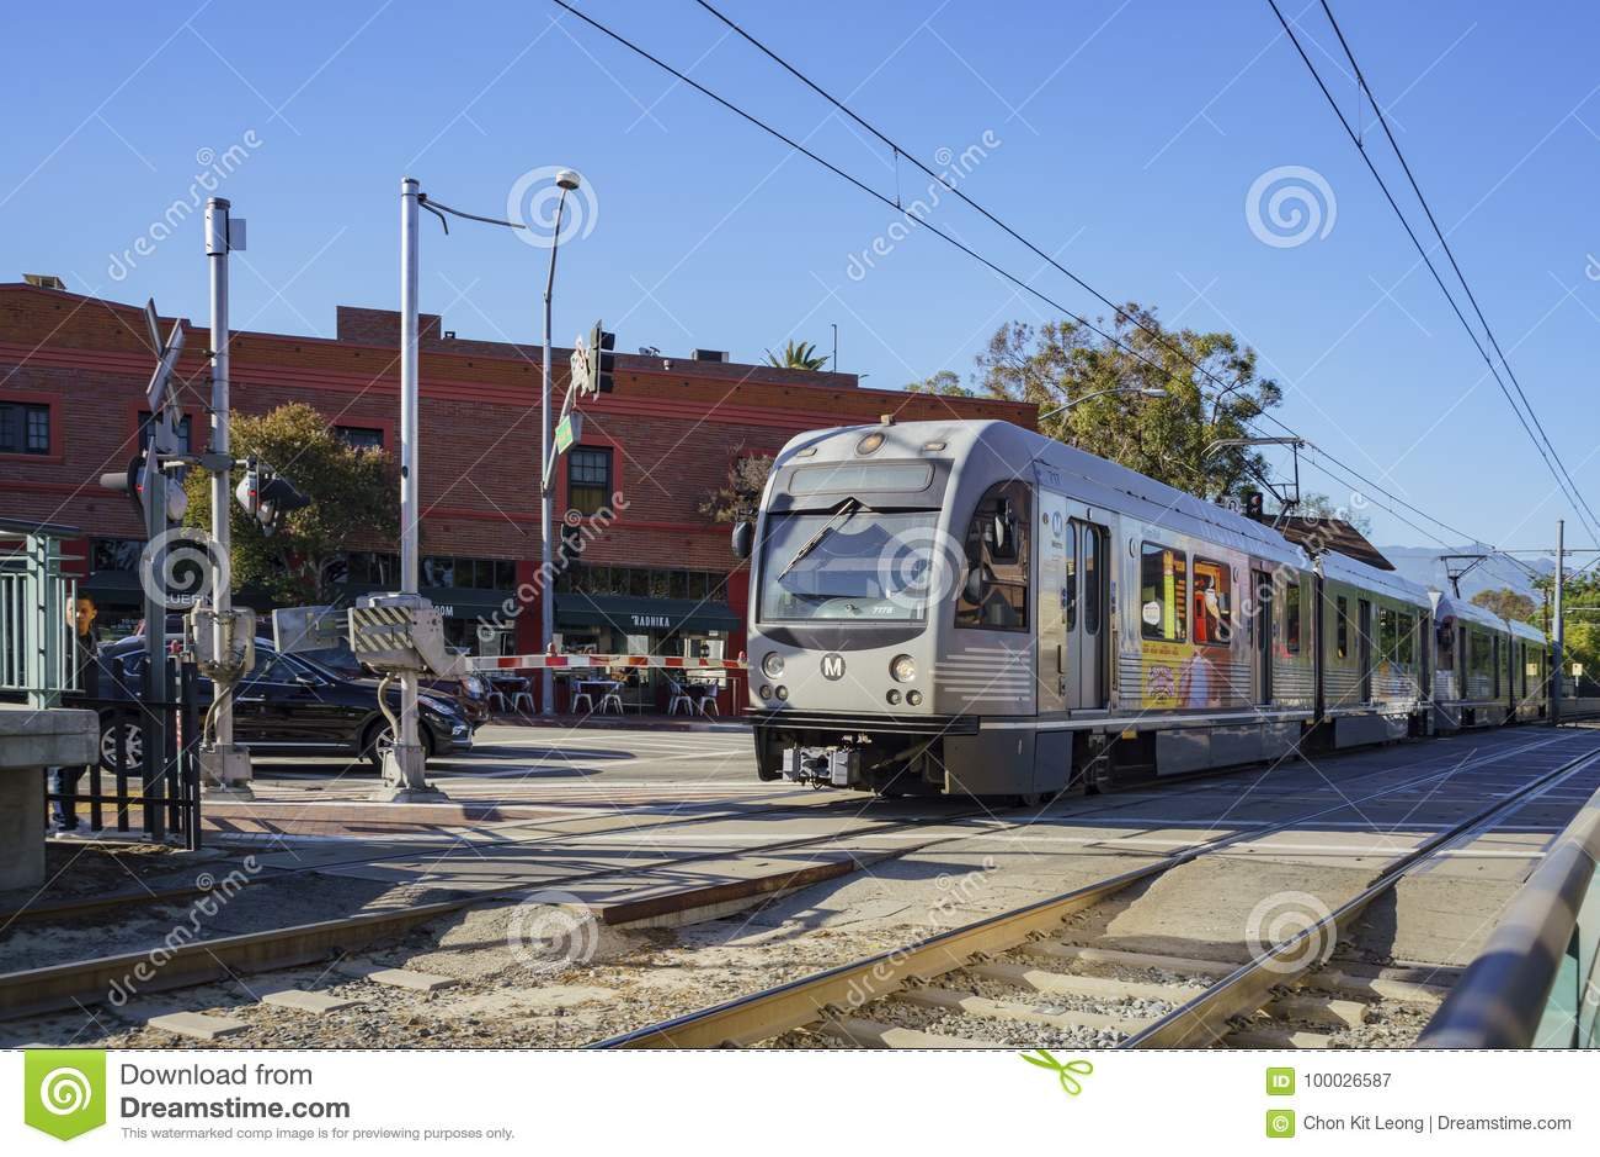 Южная станция метро Пасадина